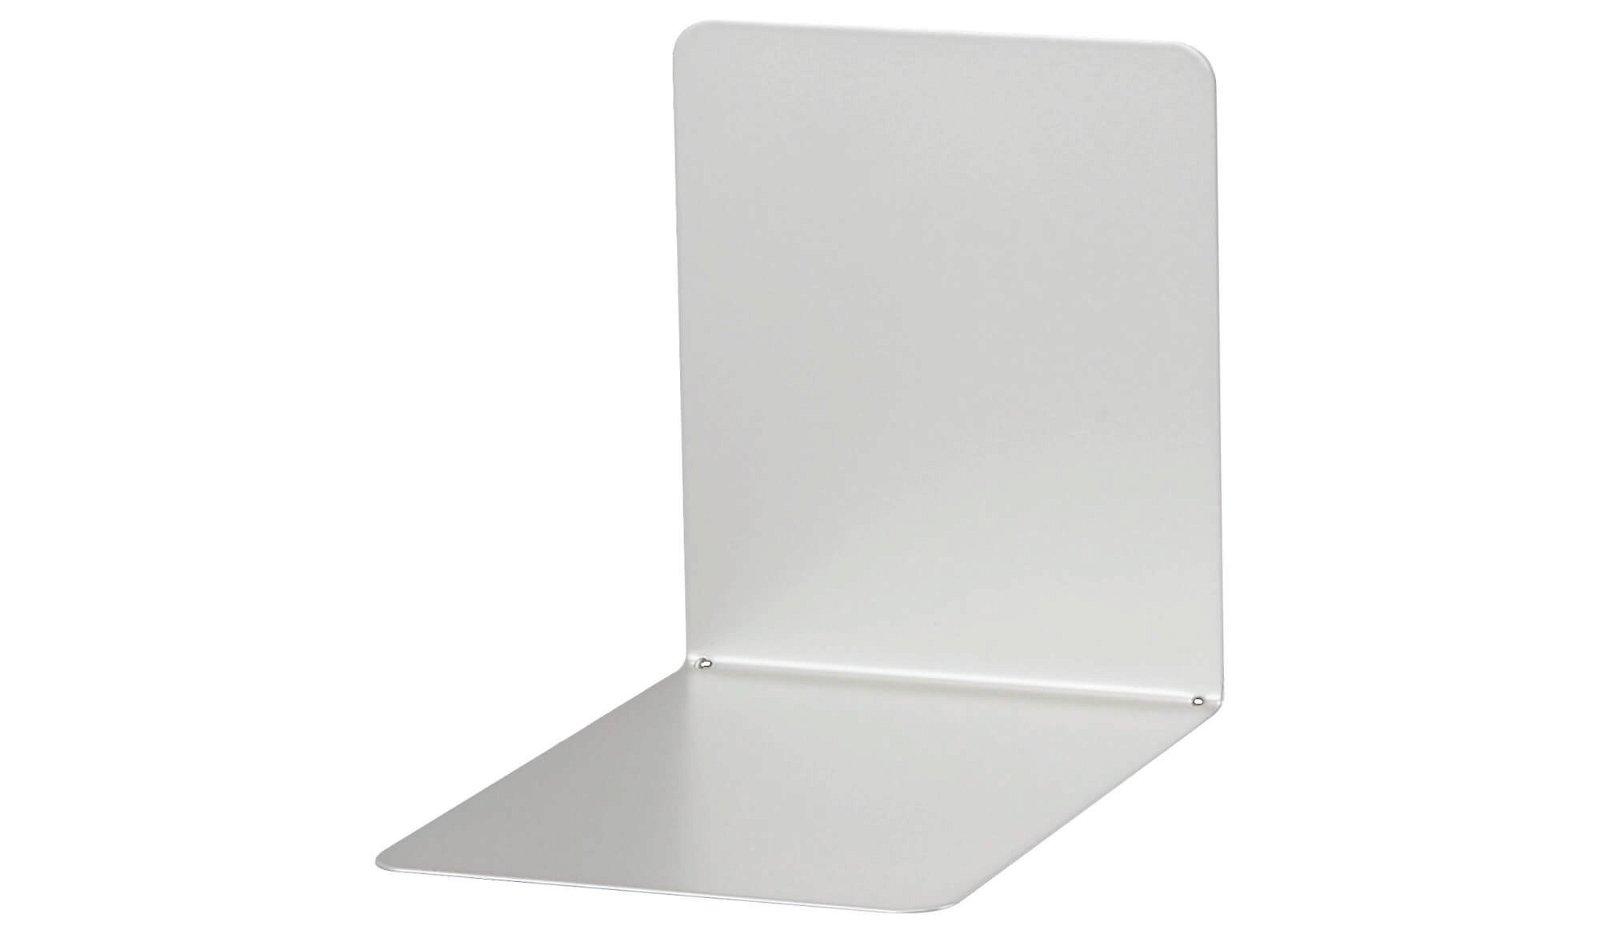 Buchstützen aus Metall, breit, 14 x 12 x 14 cm magnethaftend, silber